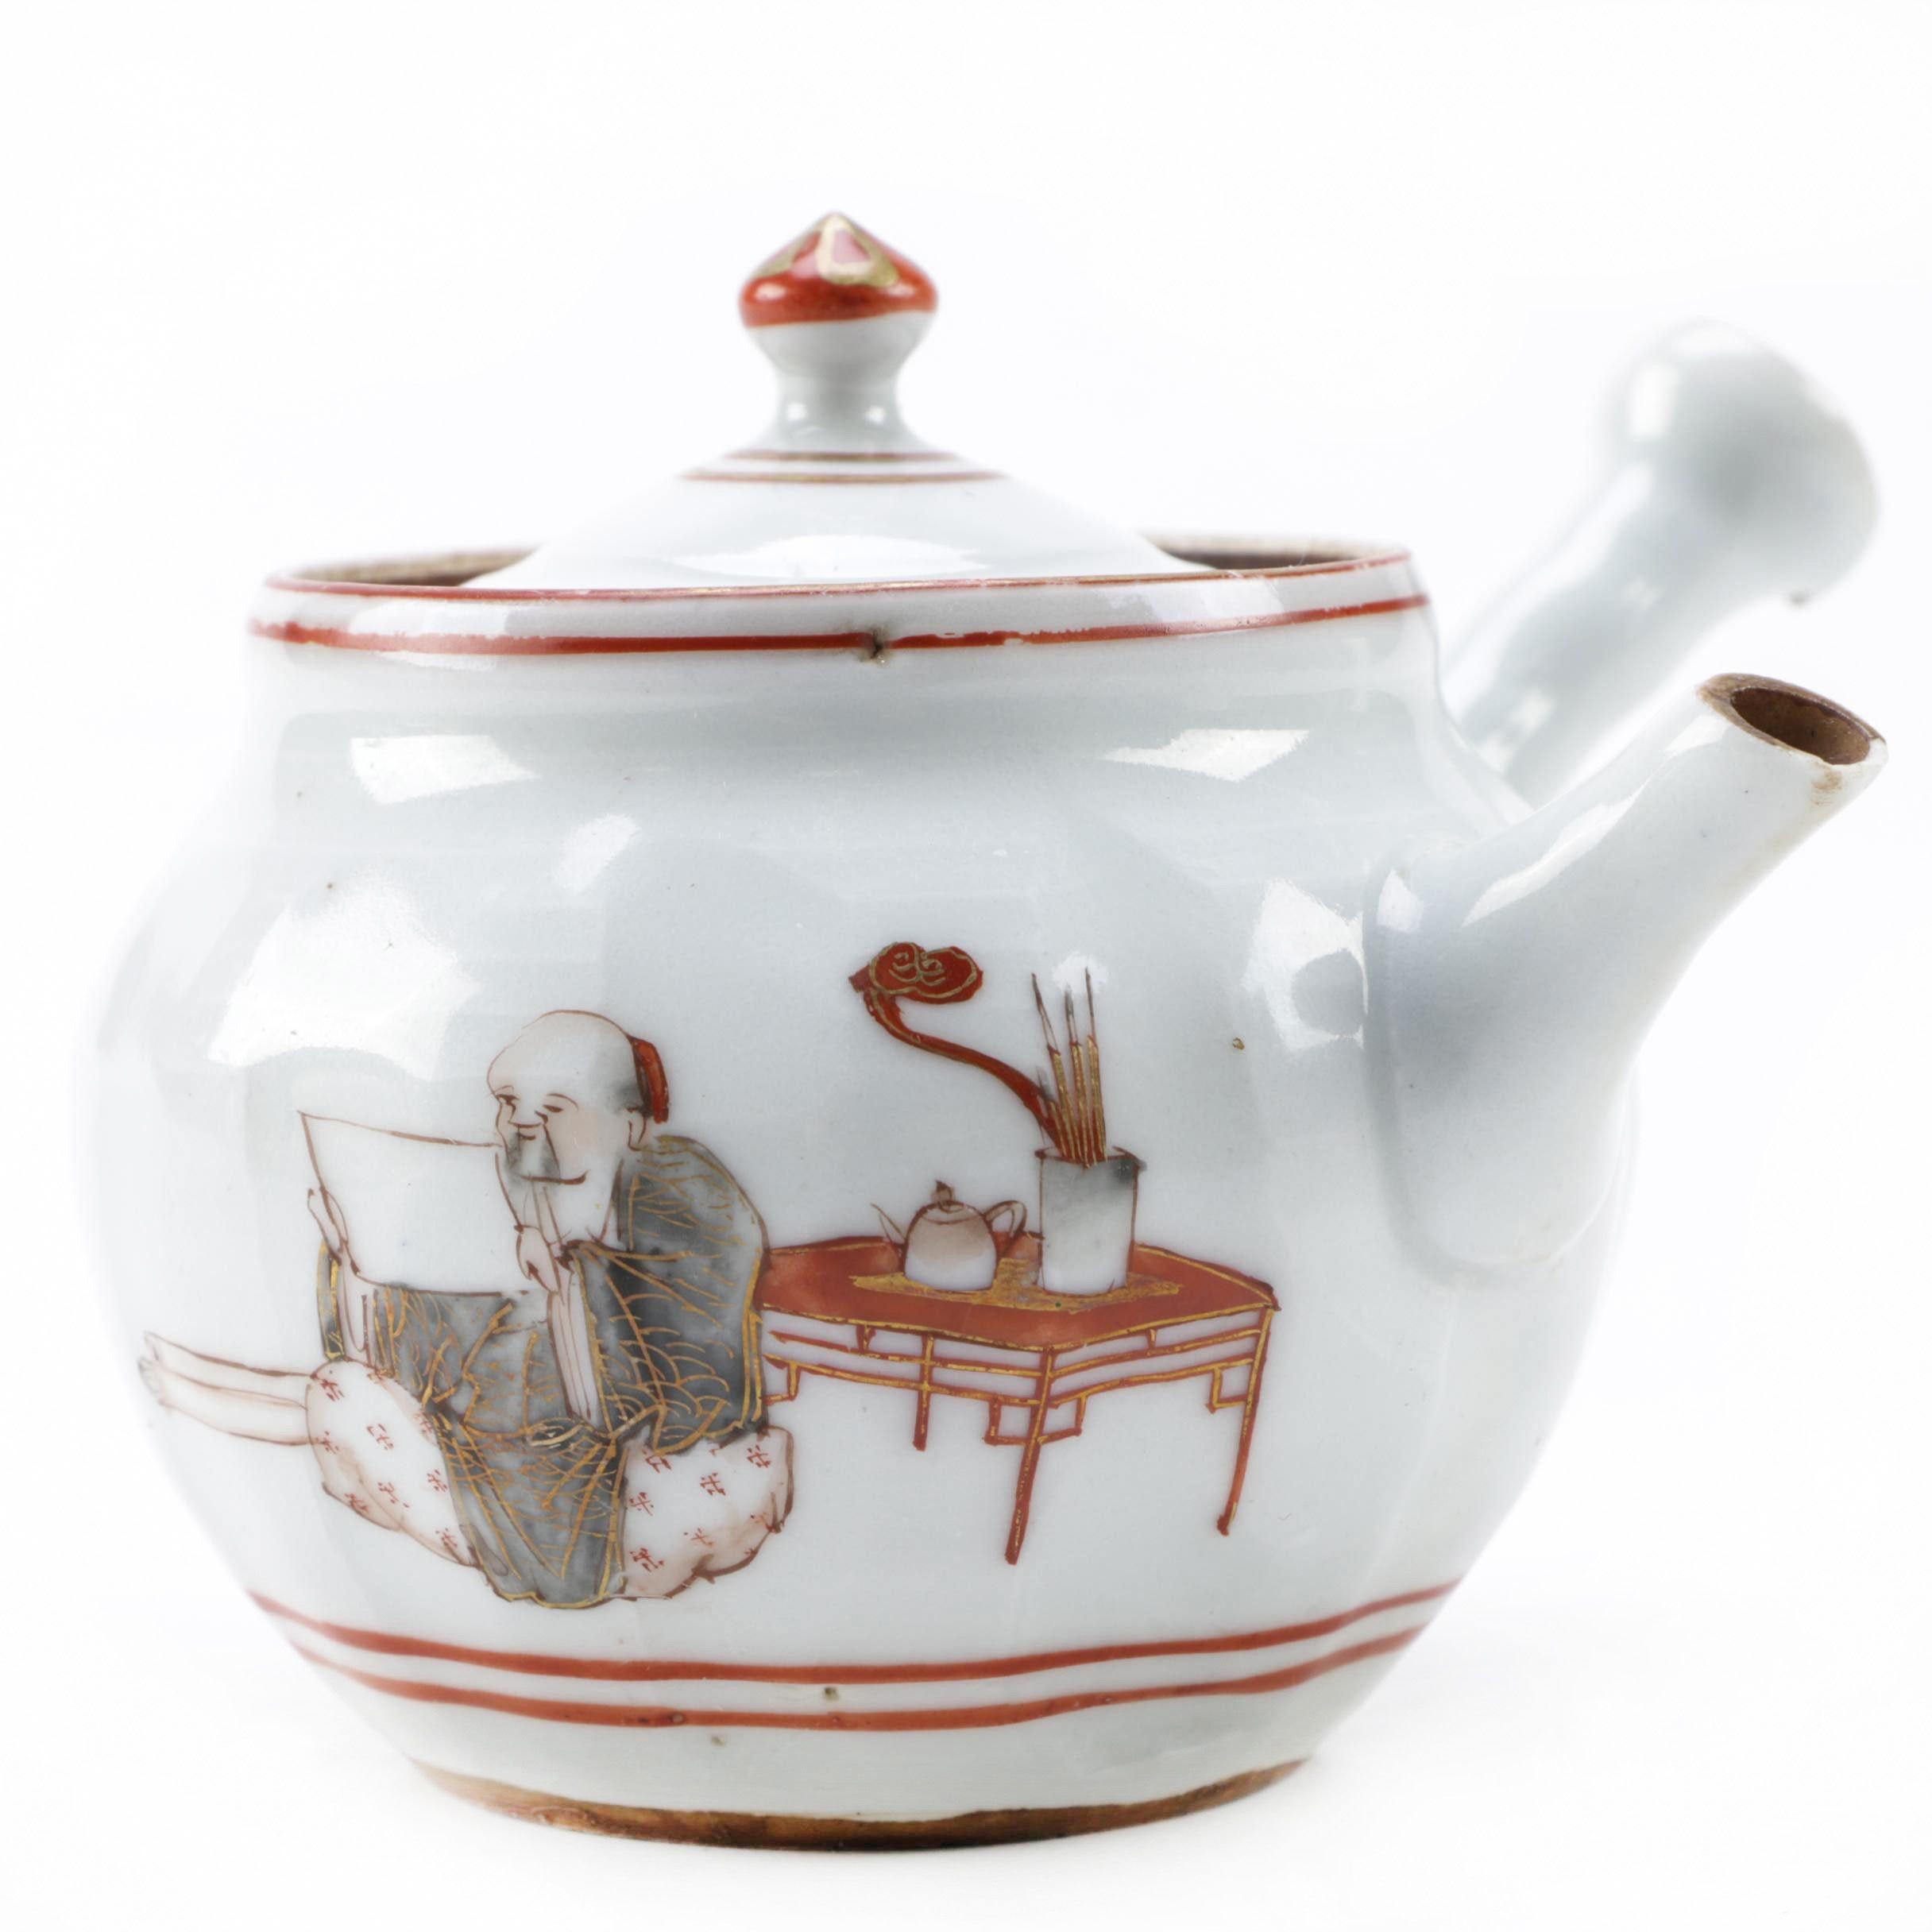 Vintage Hand-painted Japanese Kyusu Earthenware Teapot